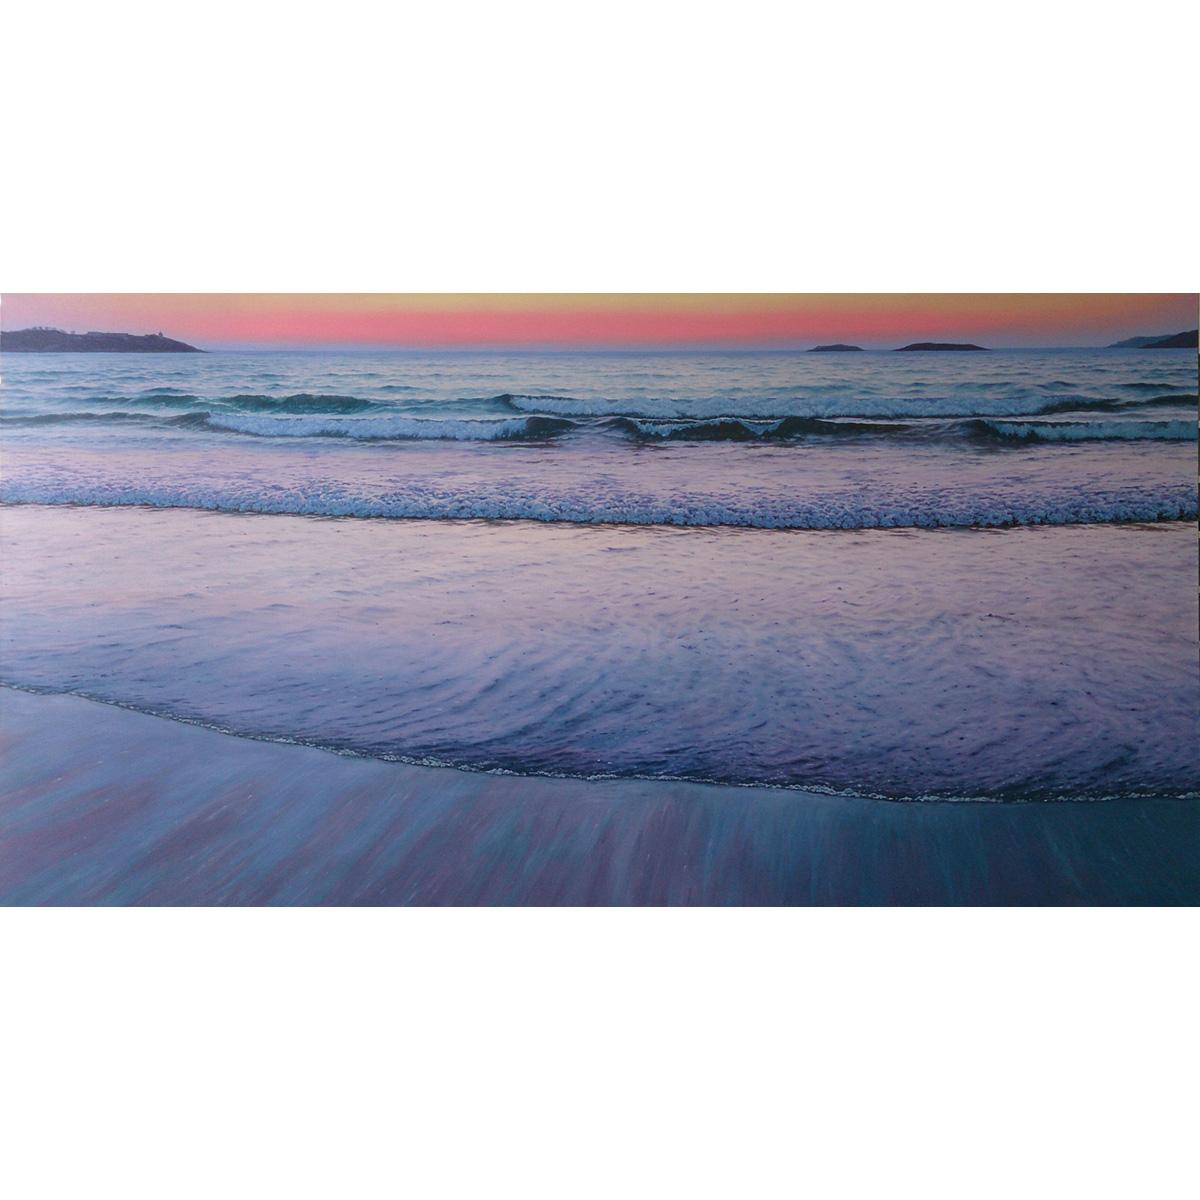 TOMÁS GUZMÁN - Playa America